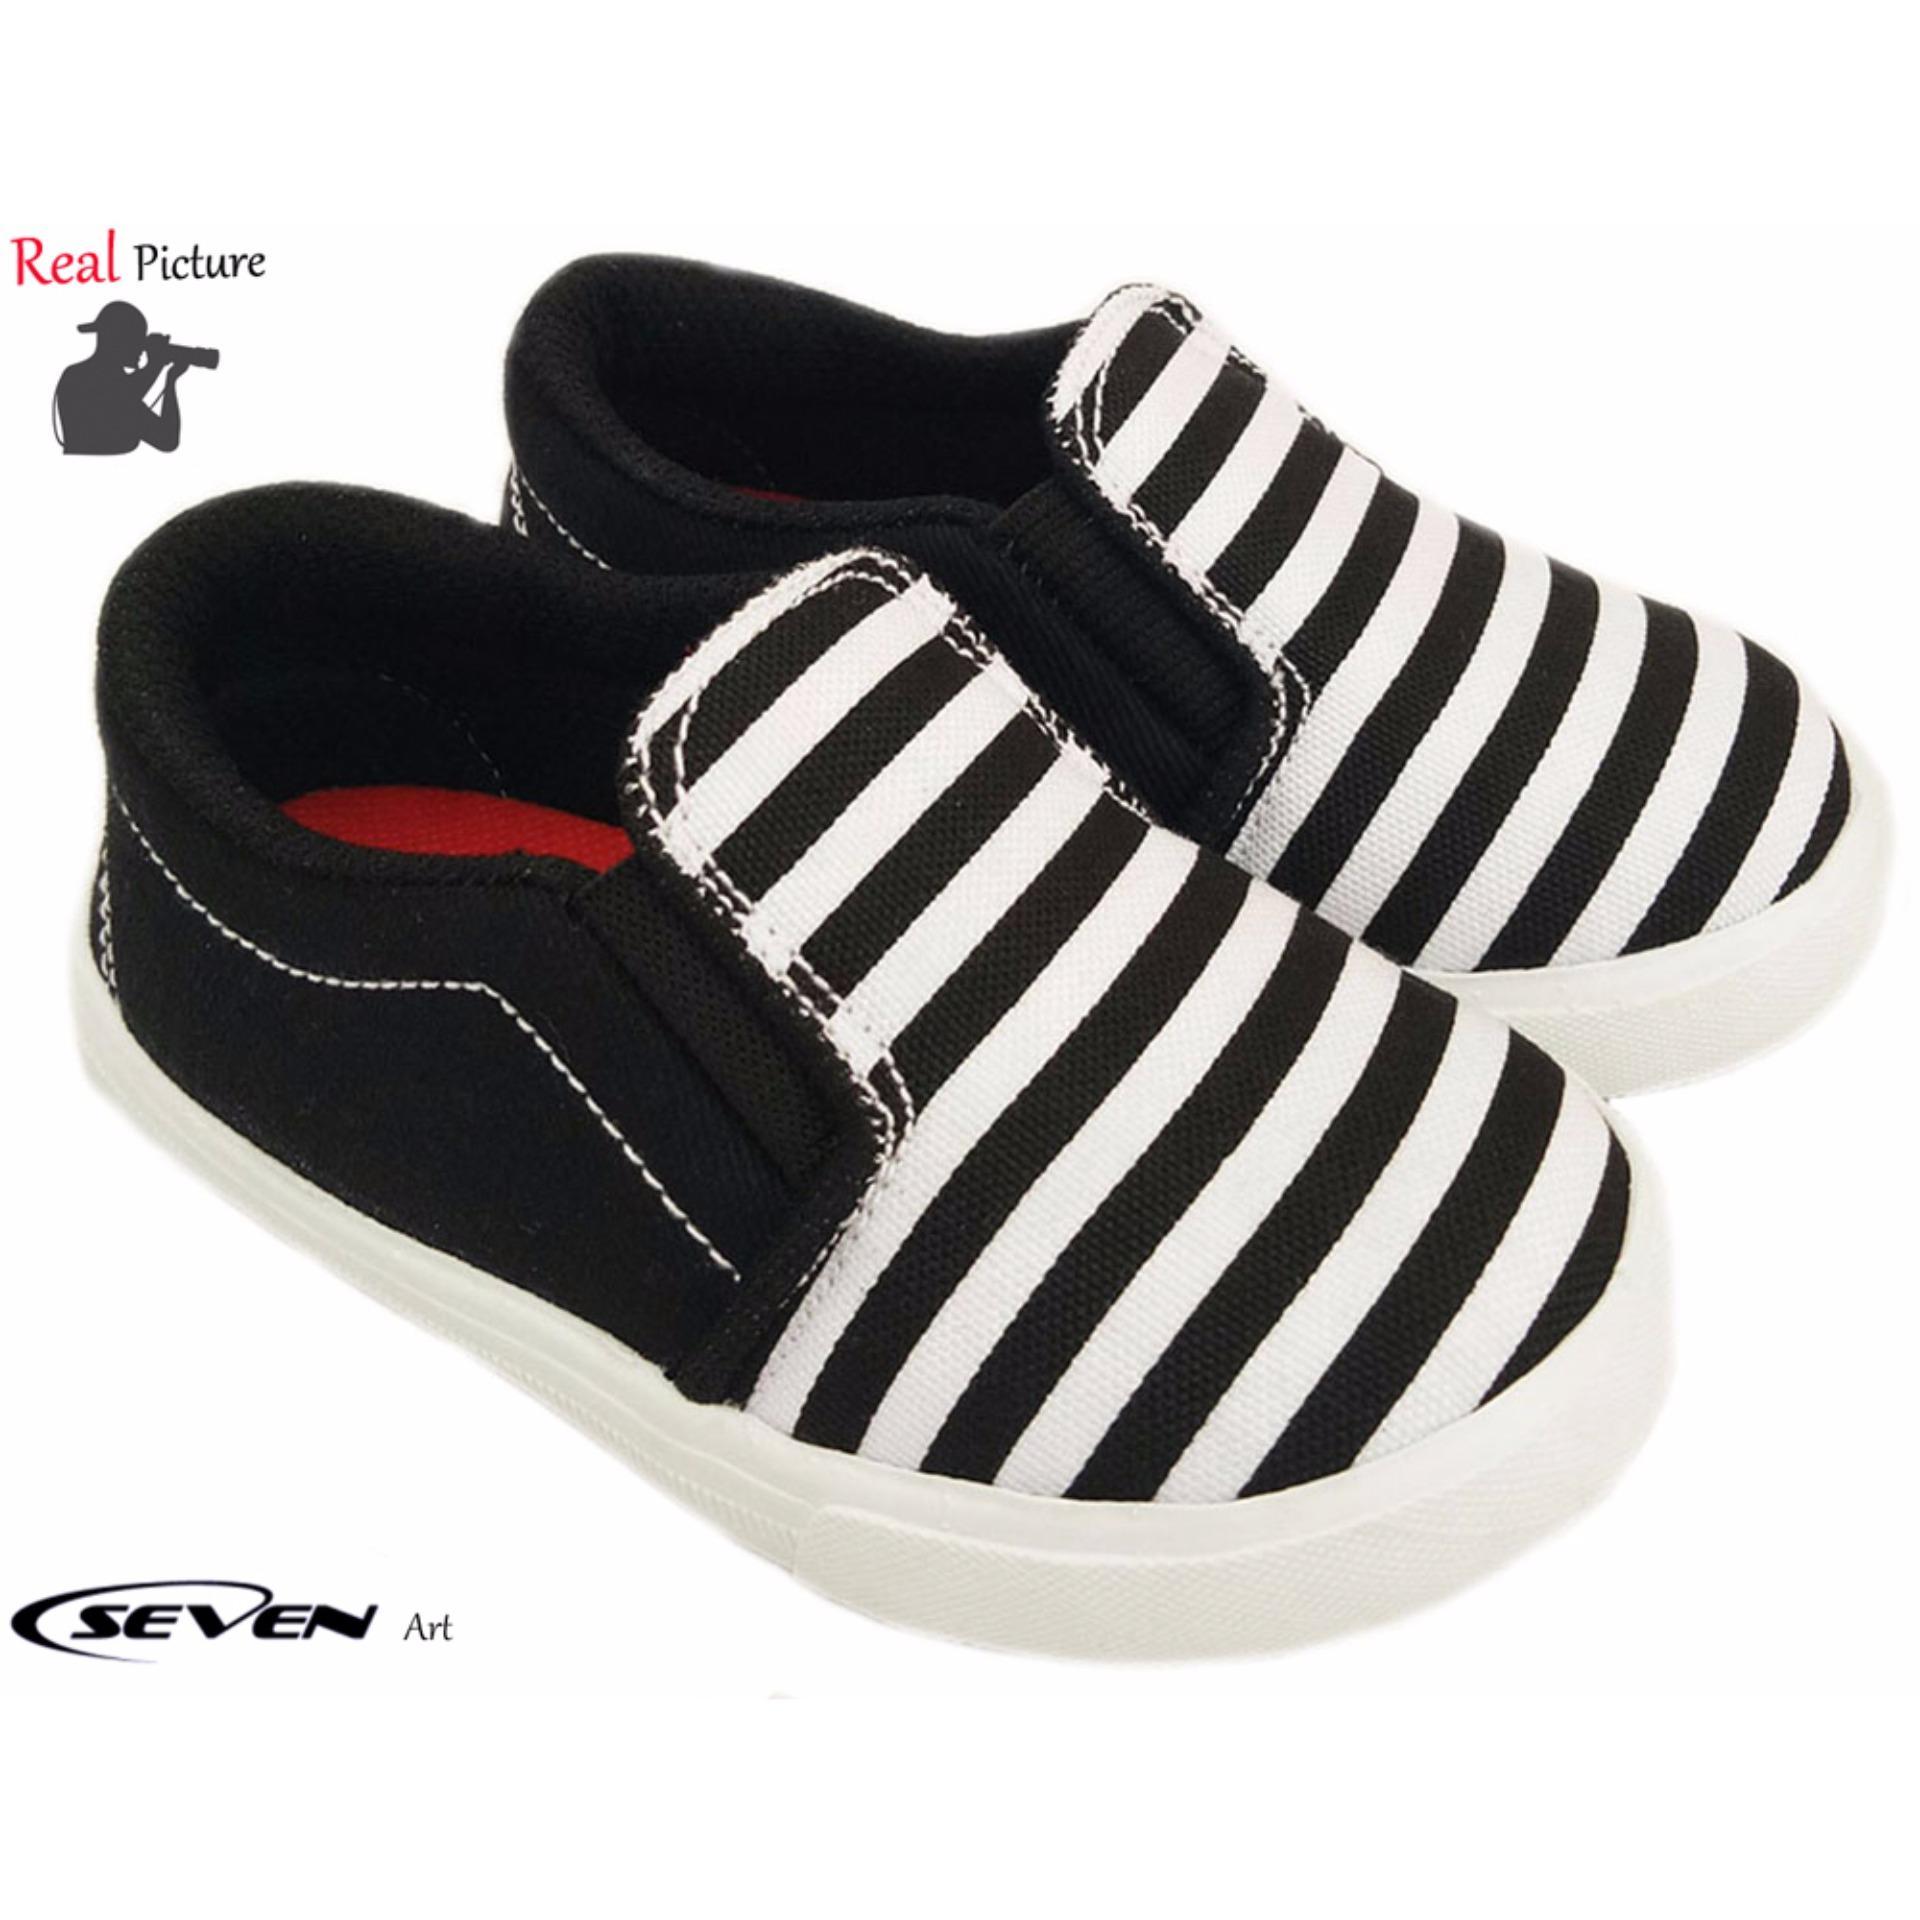 Seven Sepatu Anak Salur Hitam-MG